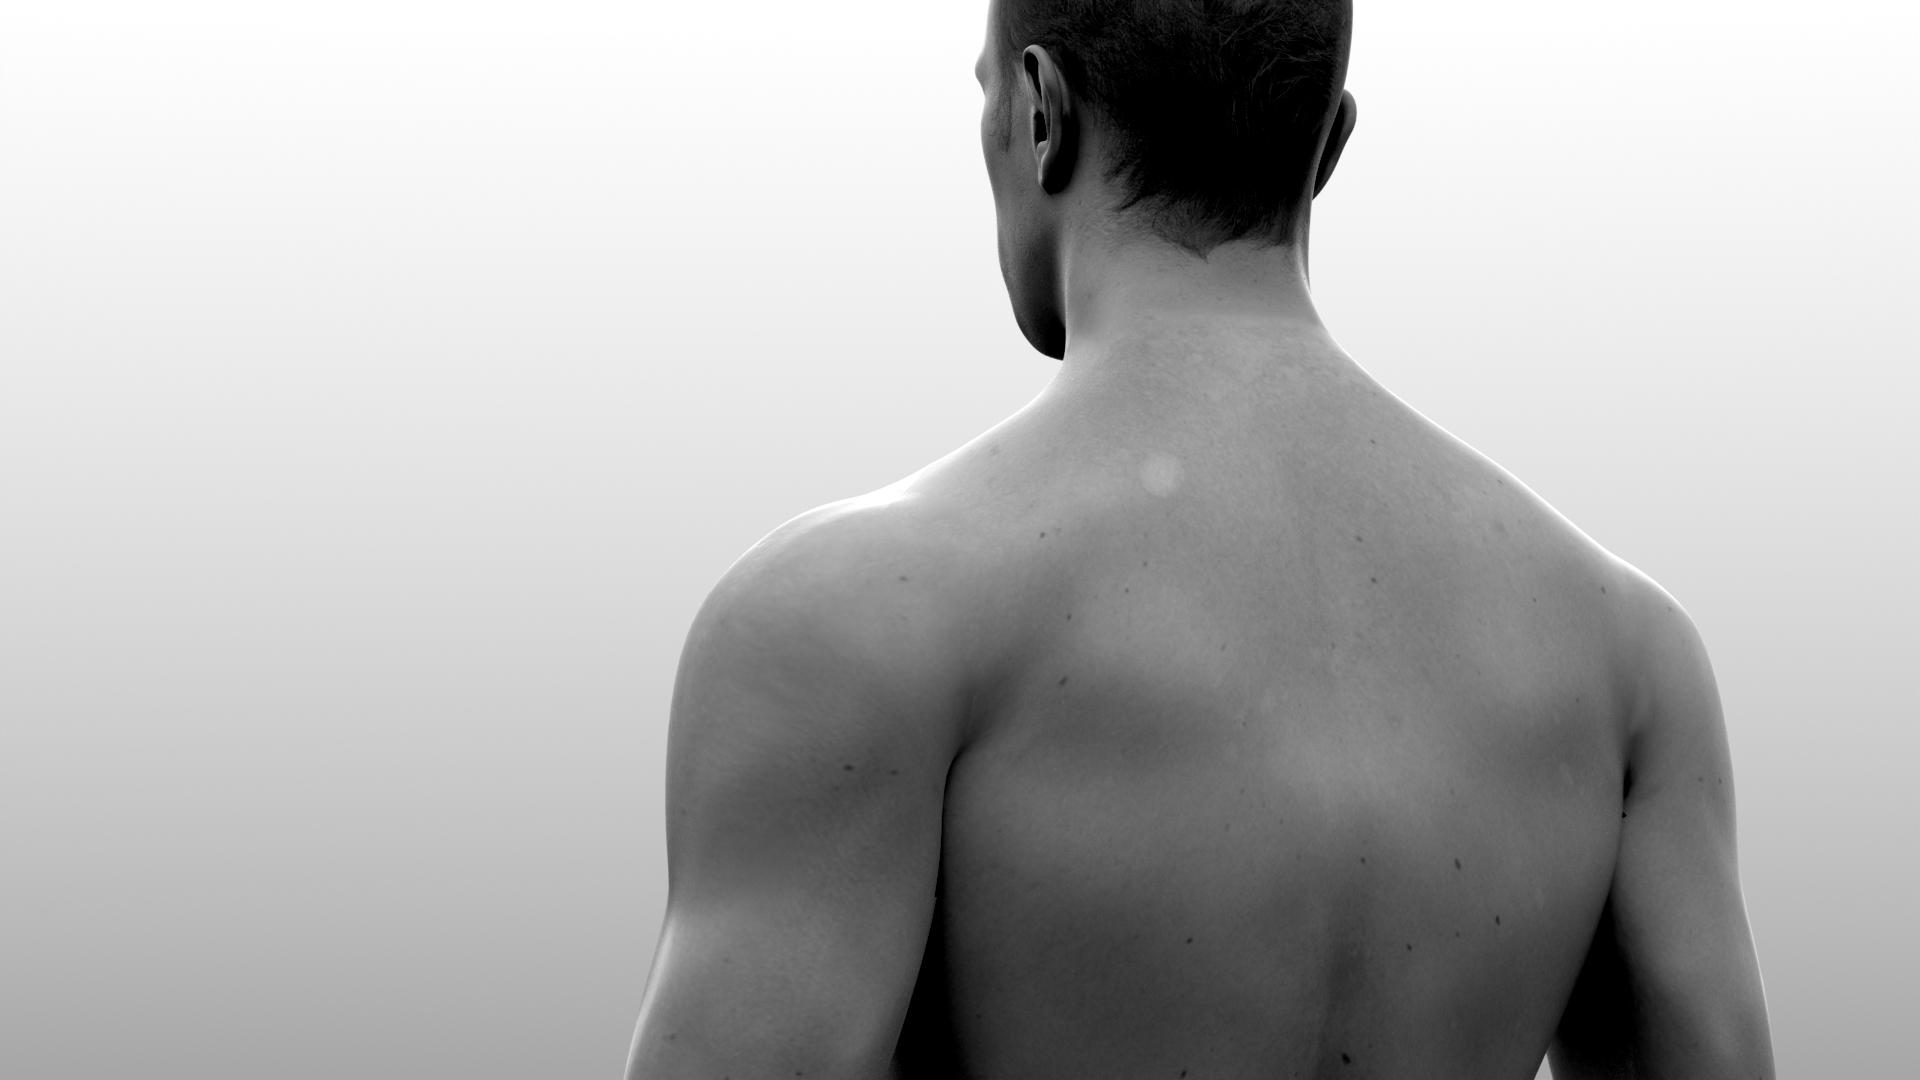 Male_back